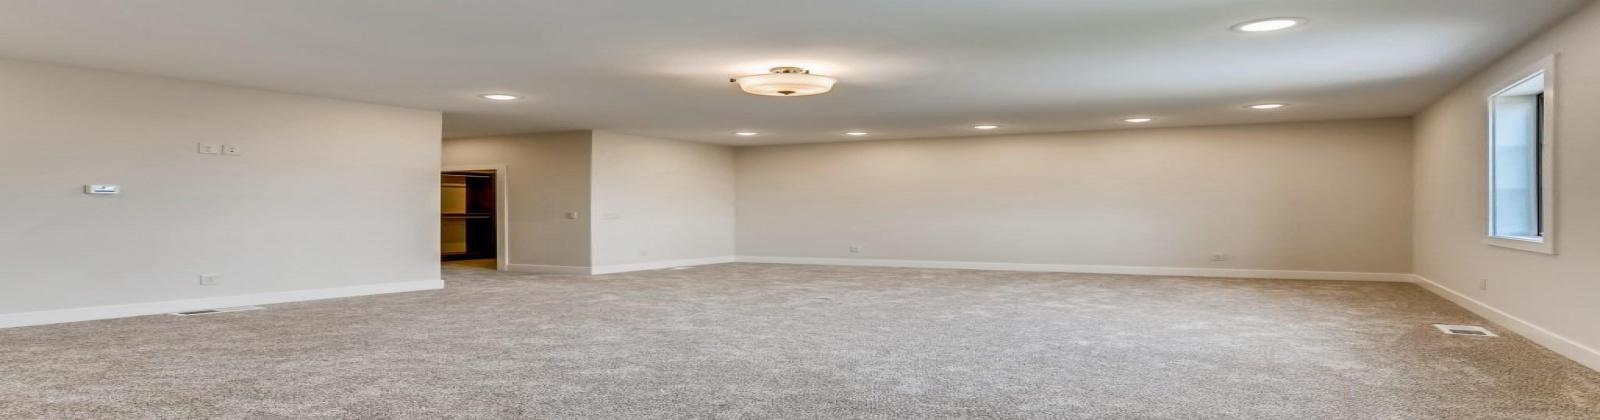 152 Alpine Court NW, Ramsey, Minnesota 55303, ,House,Pending,Alpine Court NW,1000